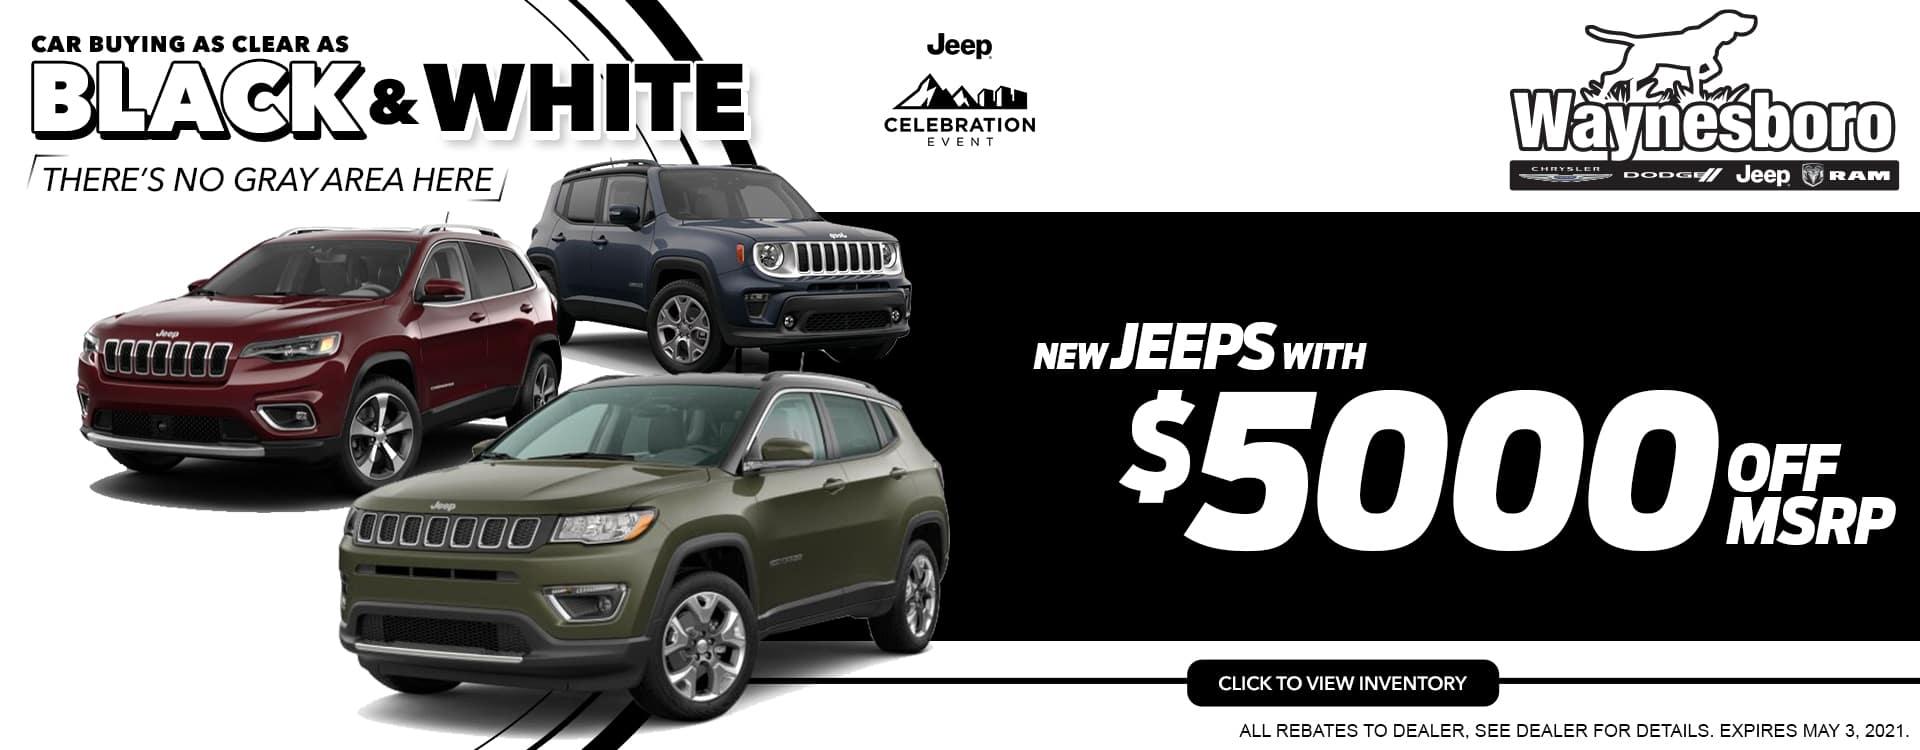 81958-WB-WACD-1920x750_jeeps